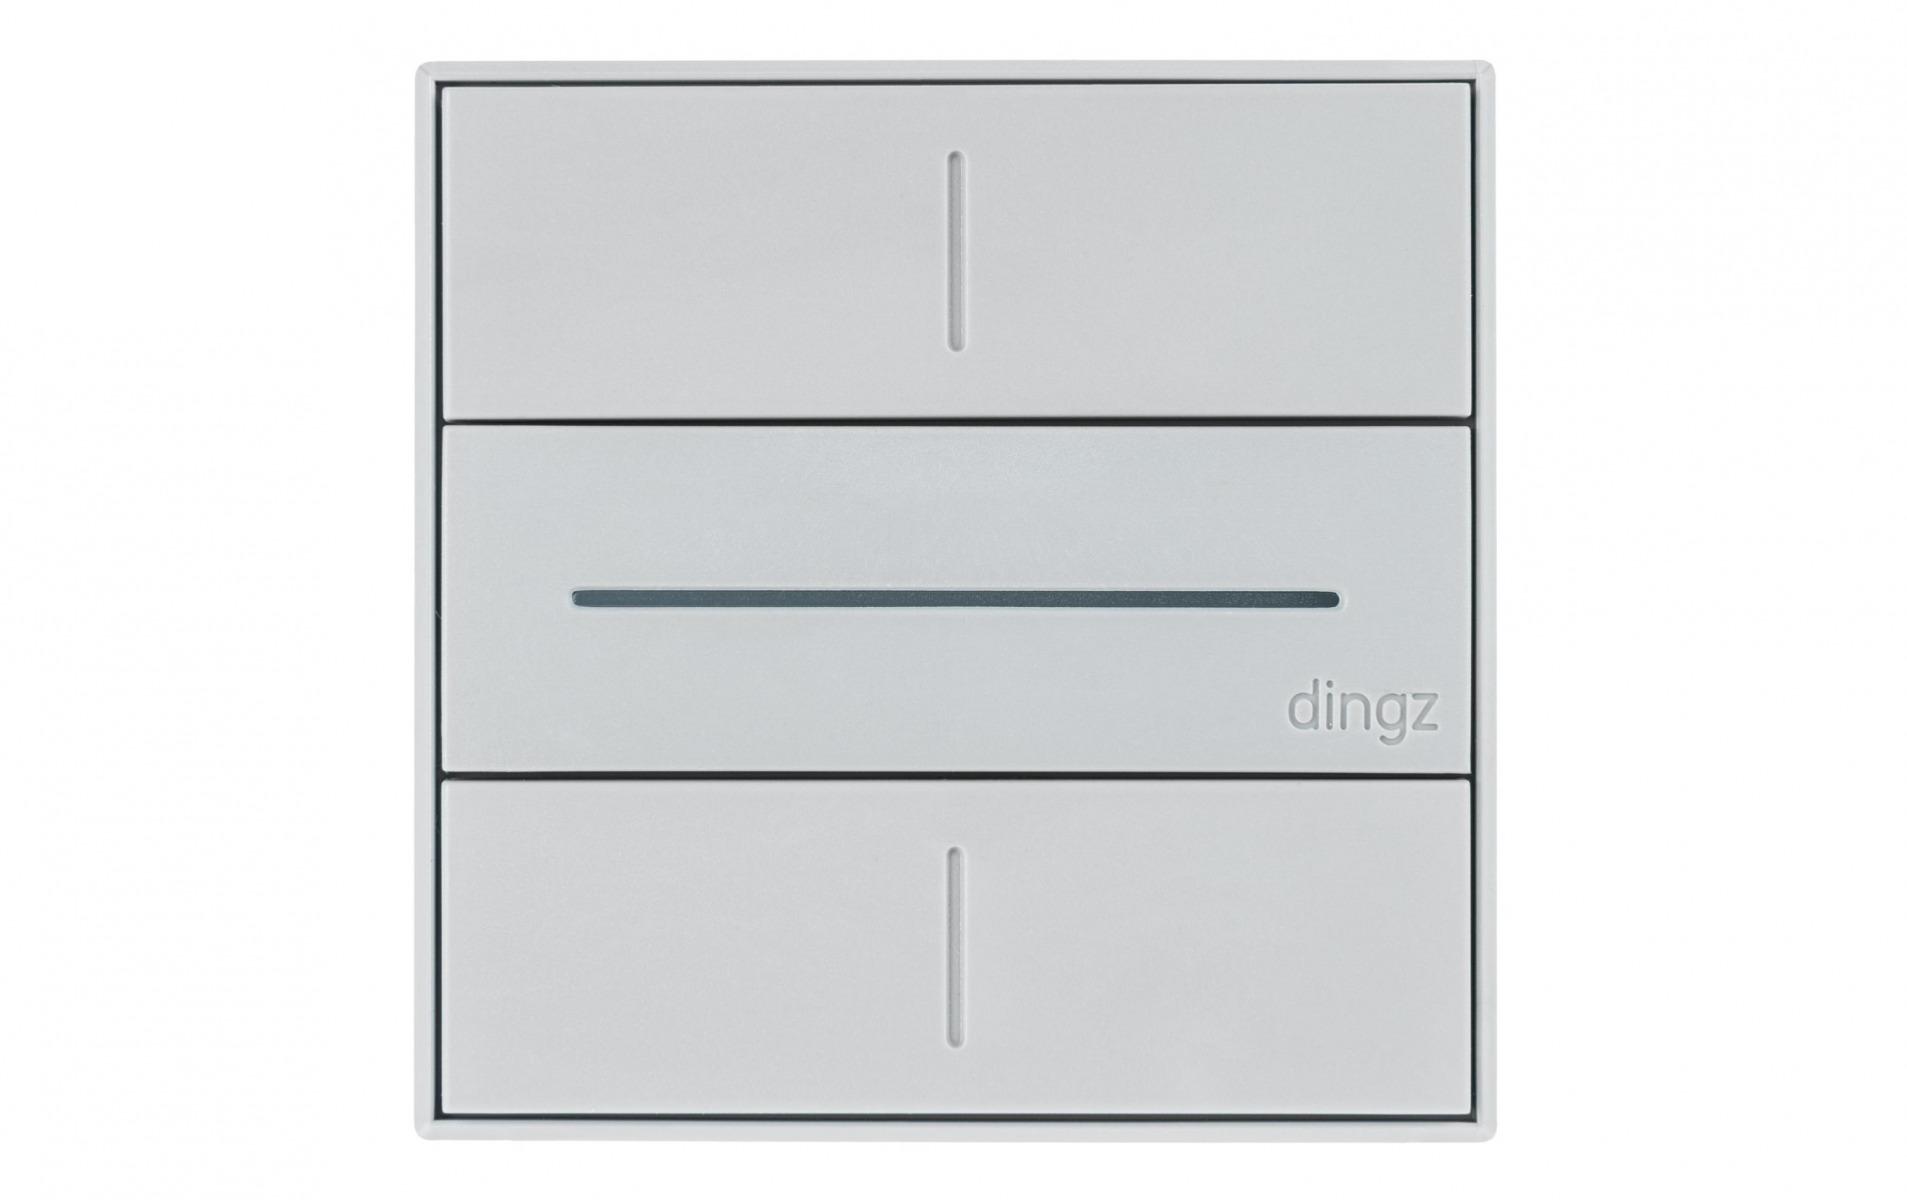 Image of dingz WLAN-Schalter «dingz» UP hellgrau